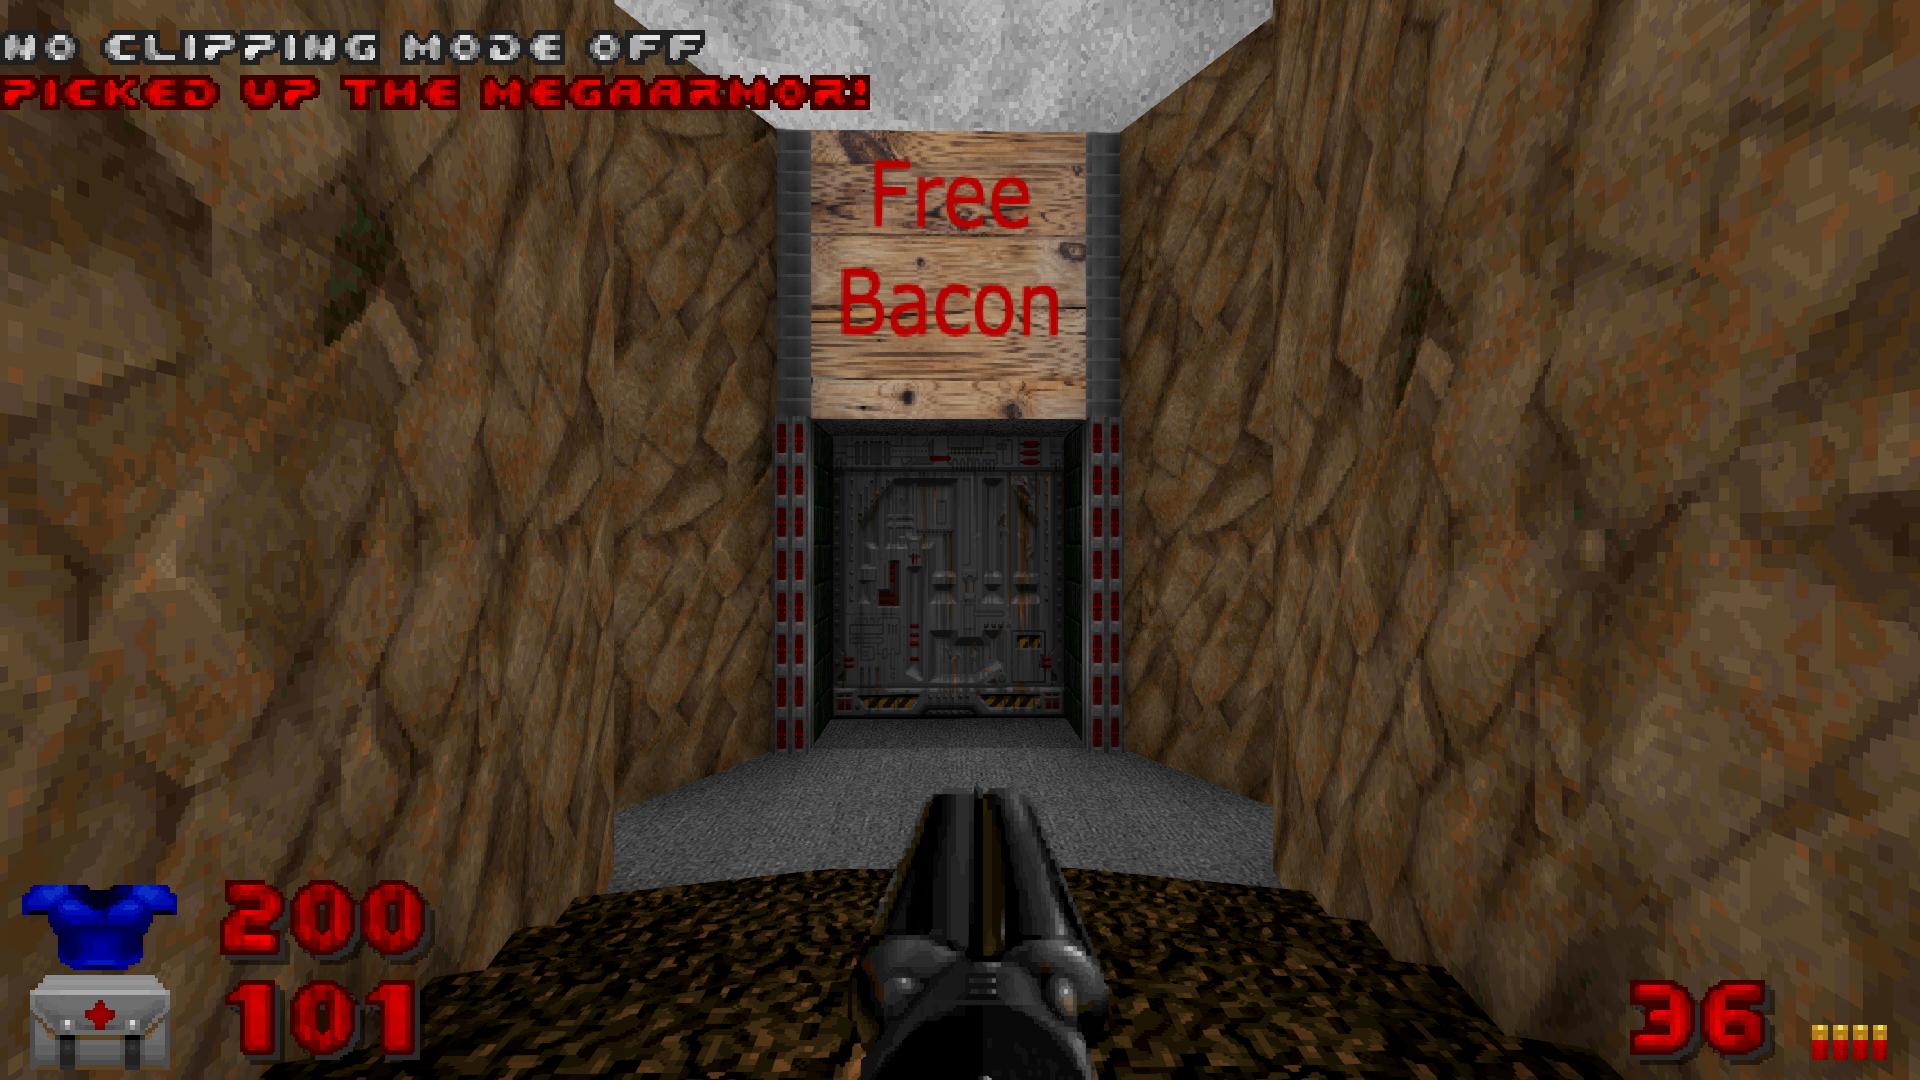 Screenshot_Doom_20210225_184657.png.c4adafaabc881addd0ebab0d8535796d.png